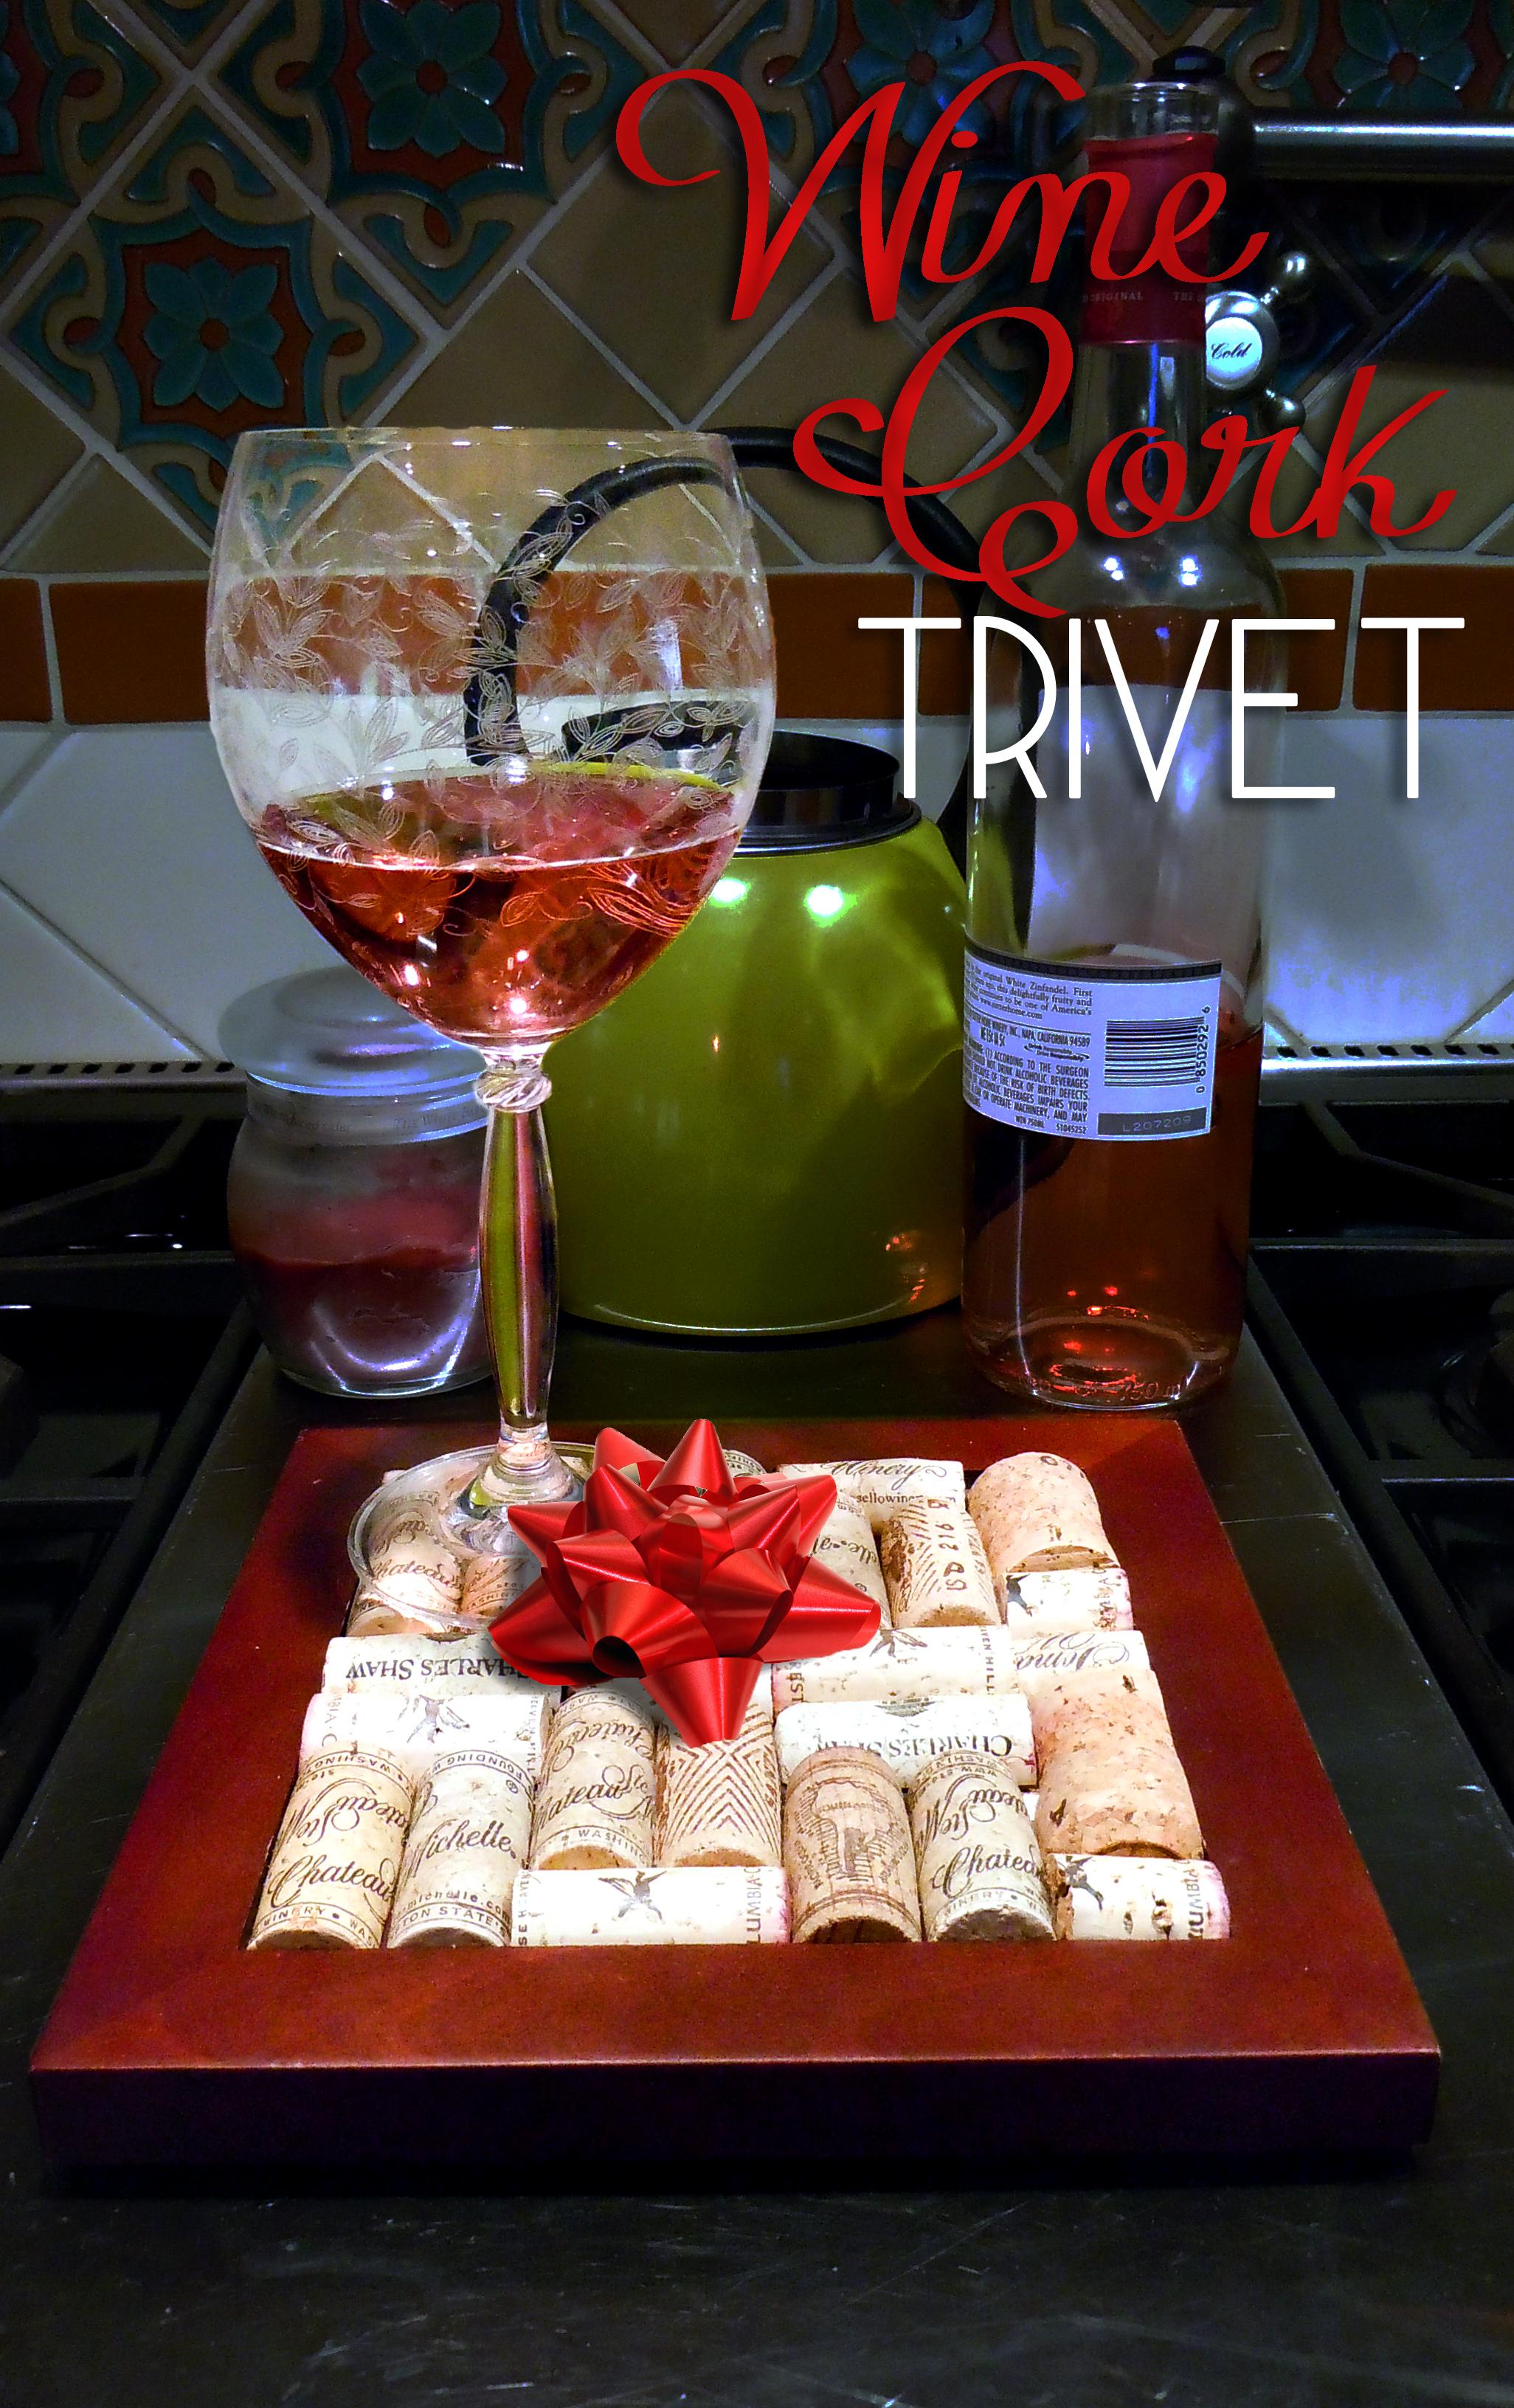 I Hope They Ll Covet This Wine Cork Trivet B B Build A Life